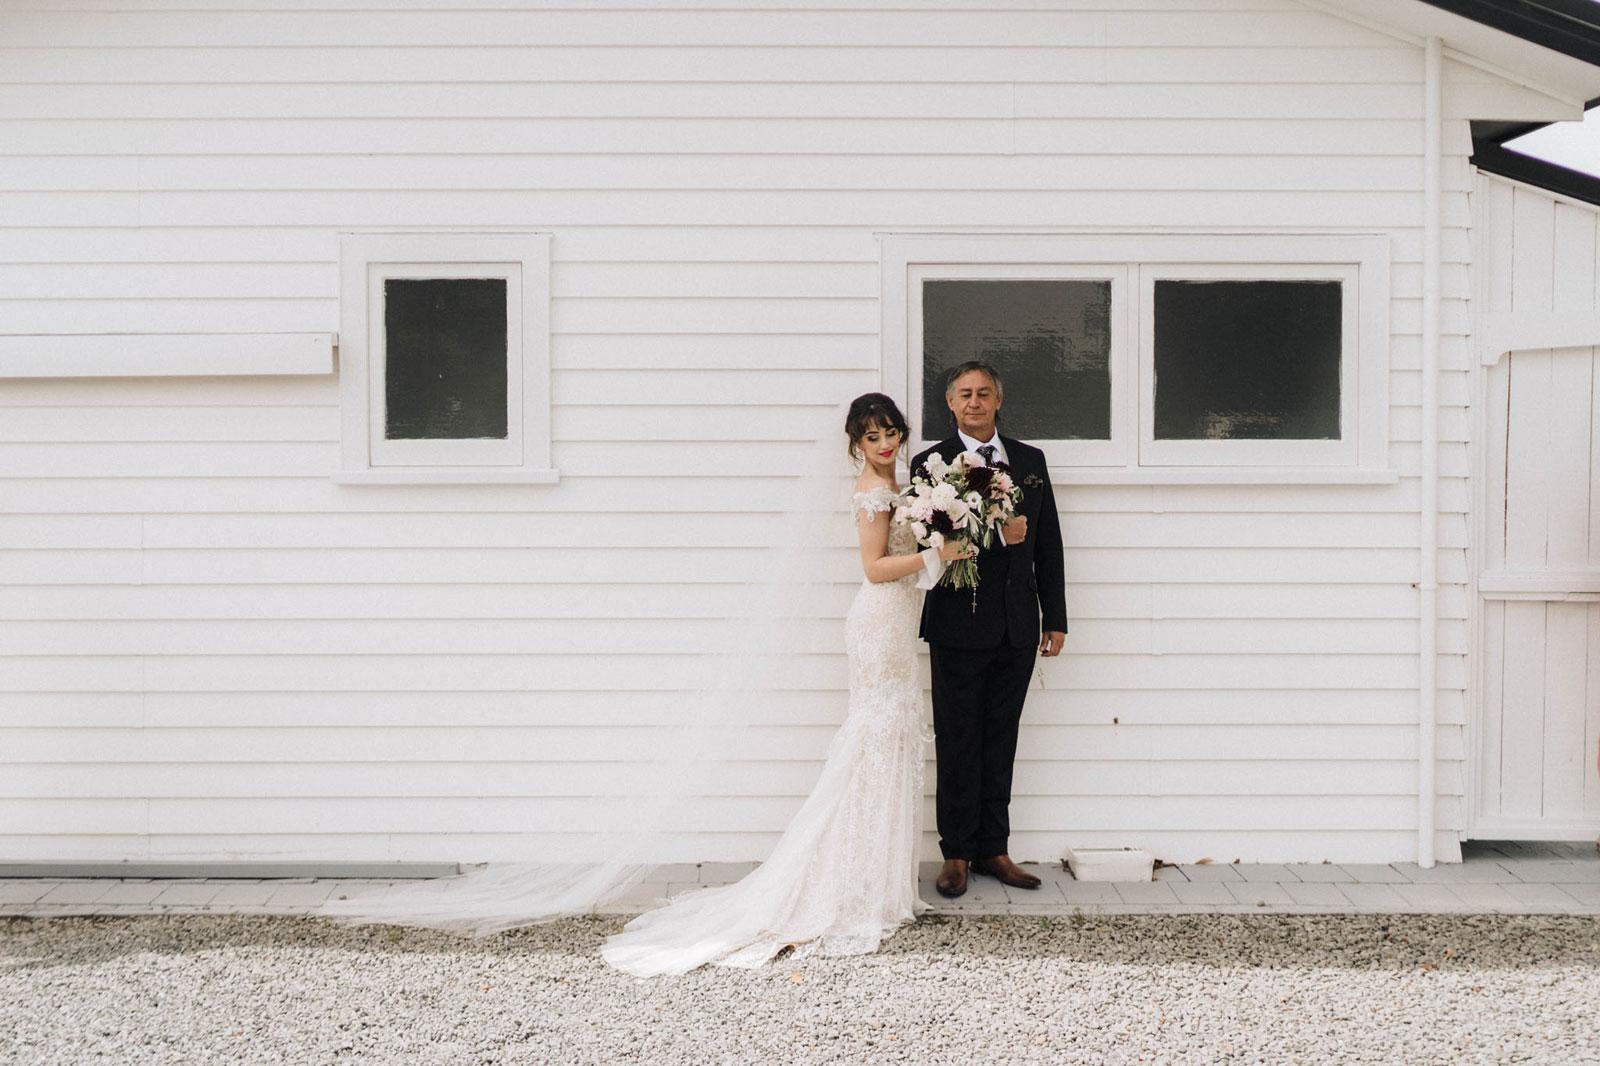 newfound-n-c-olive-tree-cottage-tauranga-wedding-photographer-354